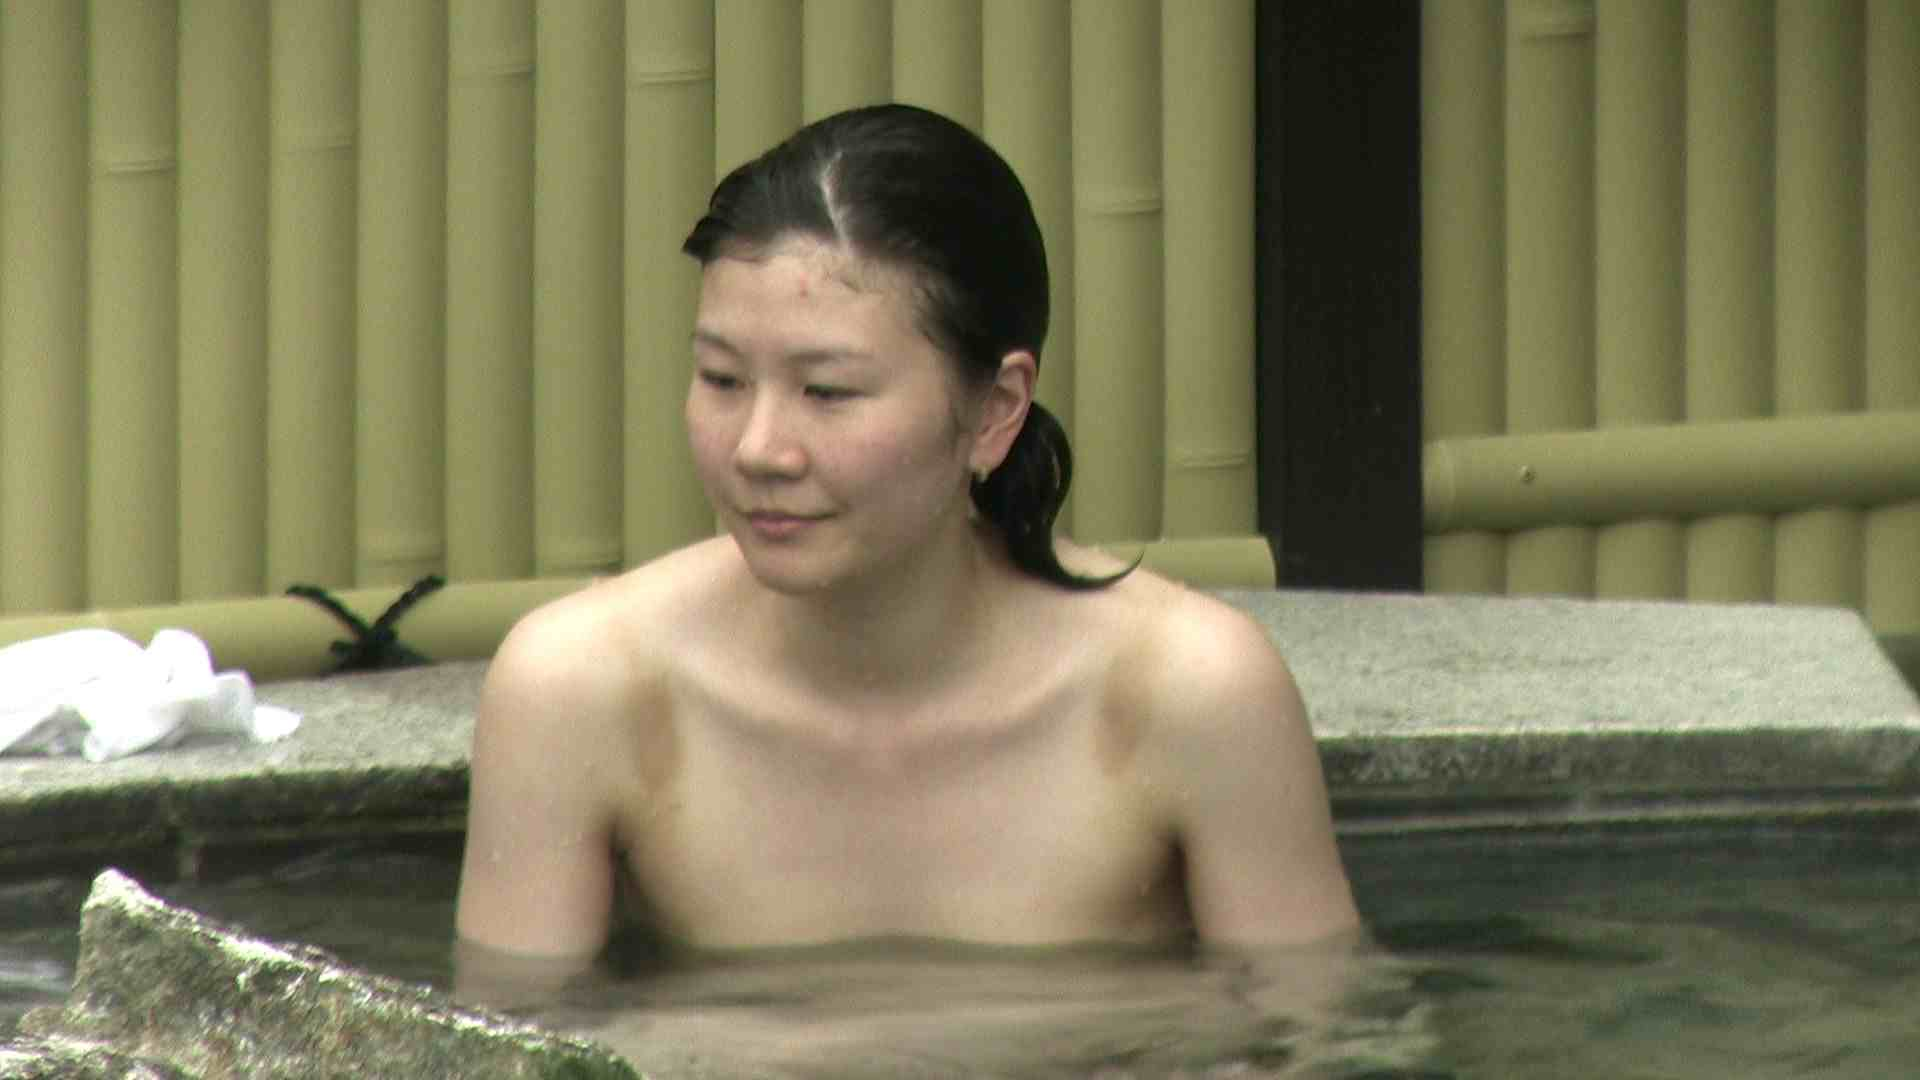 Aquaな露天風呂Vol.187 盗撮映像  99Pix 4